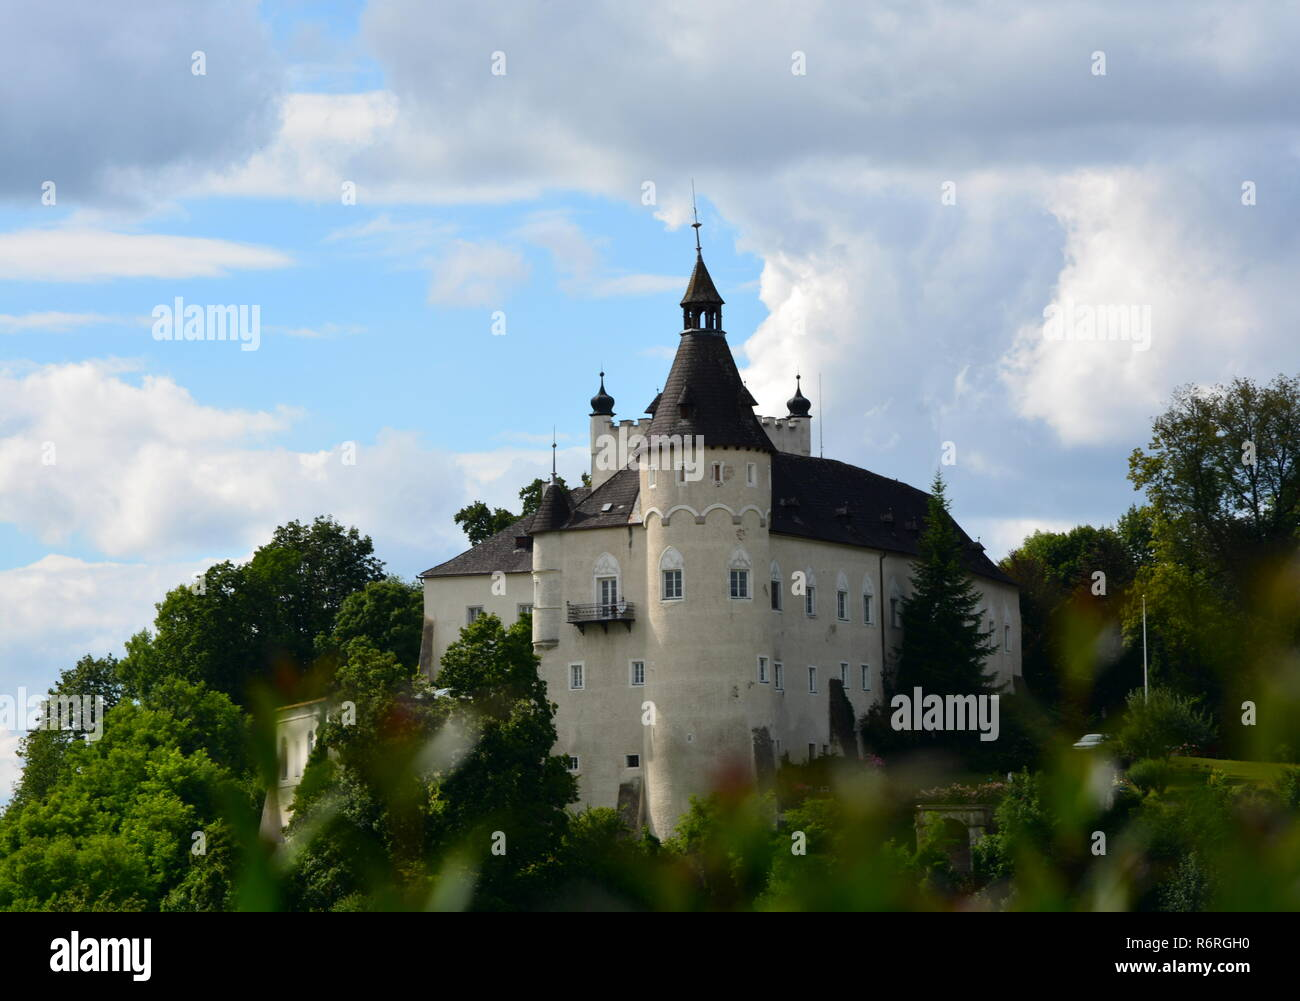 ottensheim castle Stock Photo